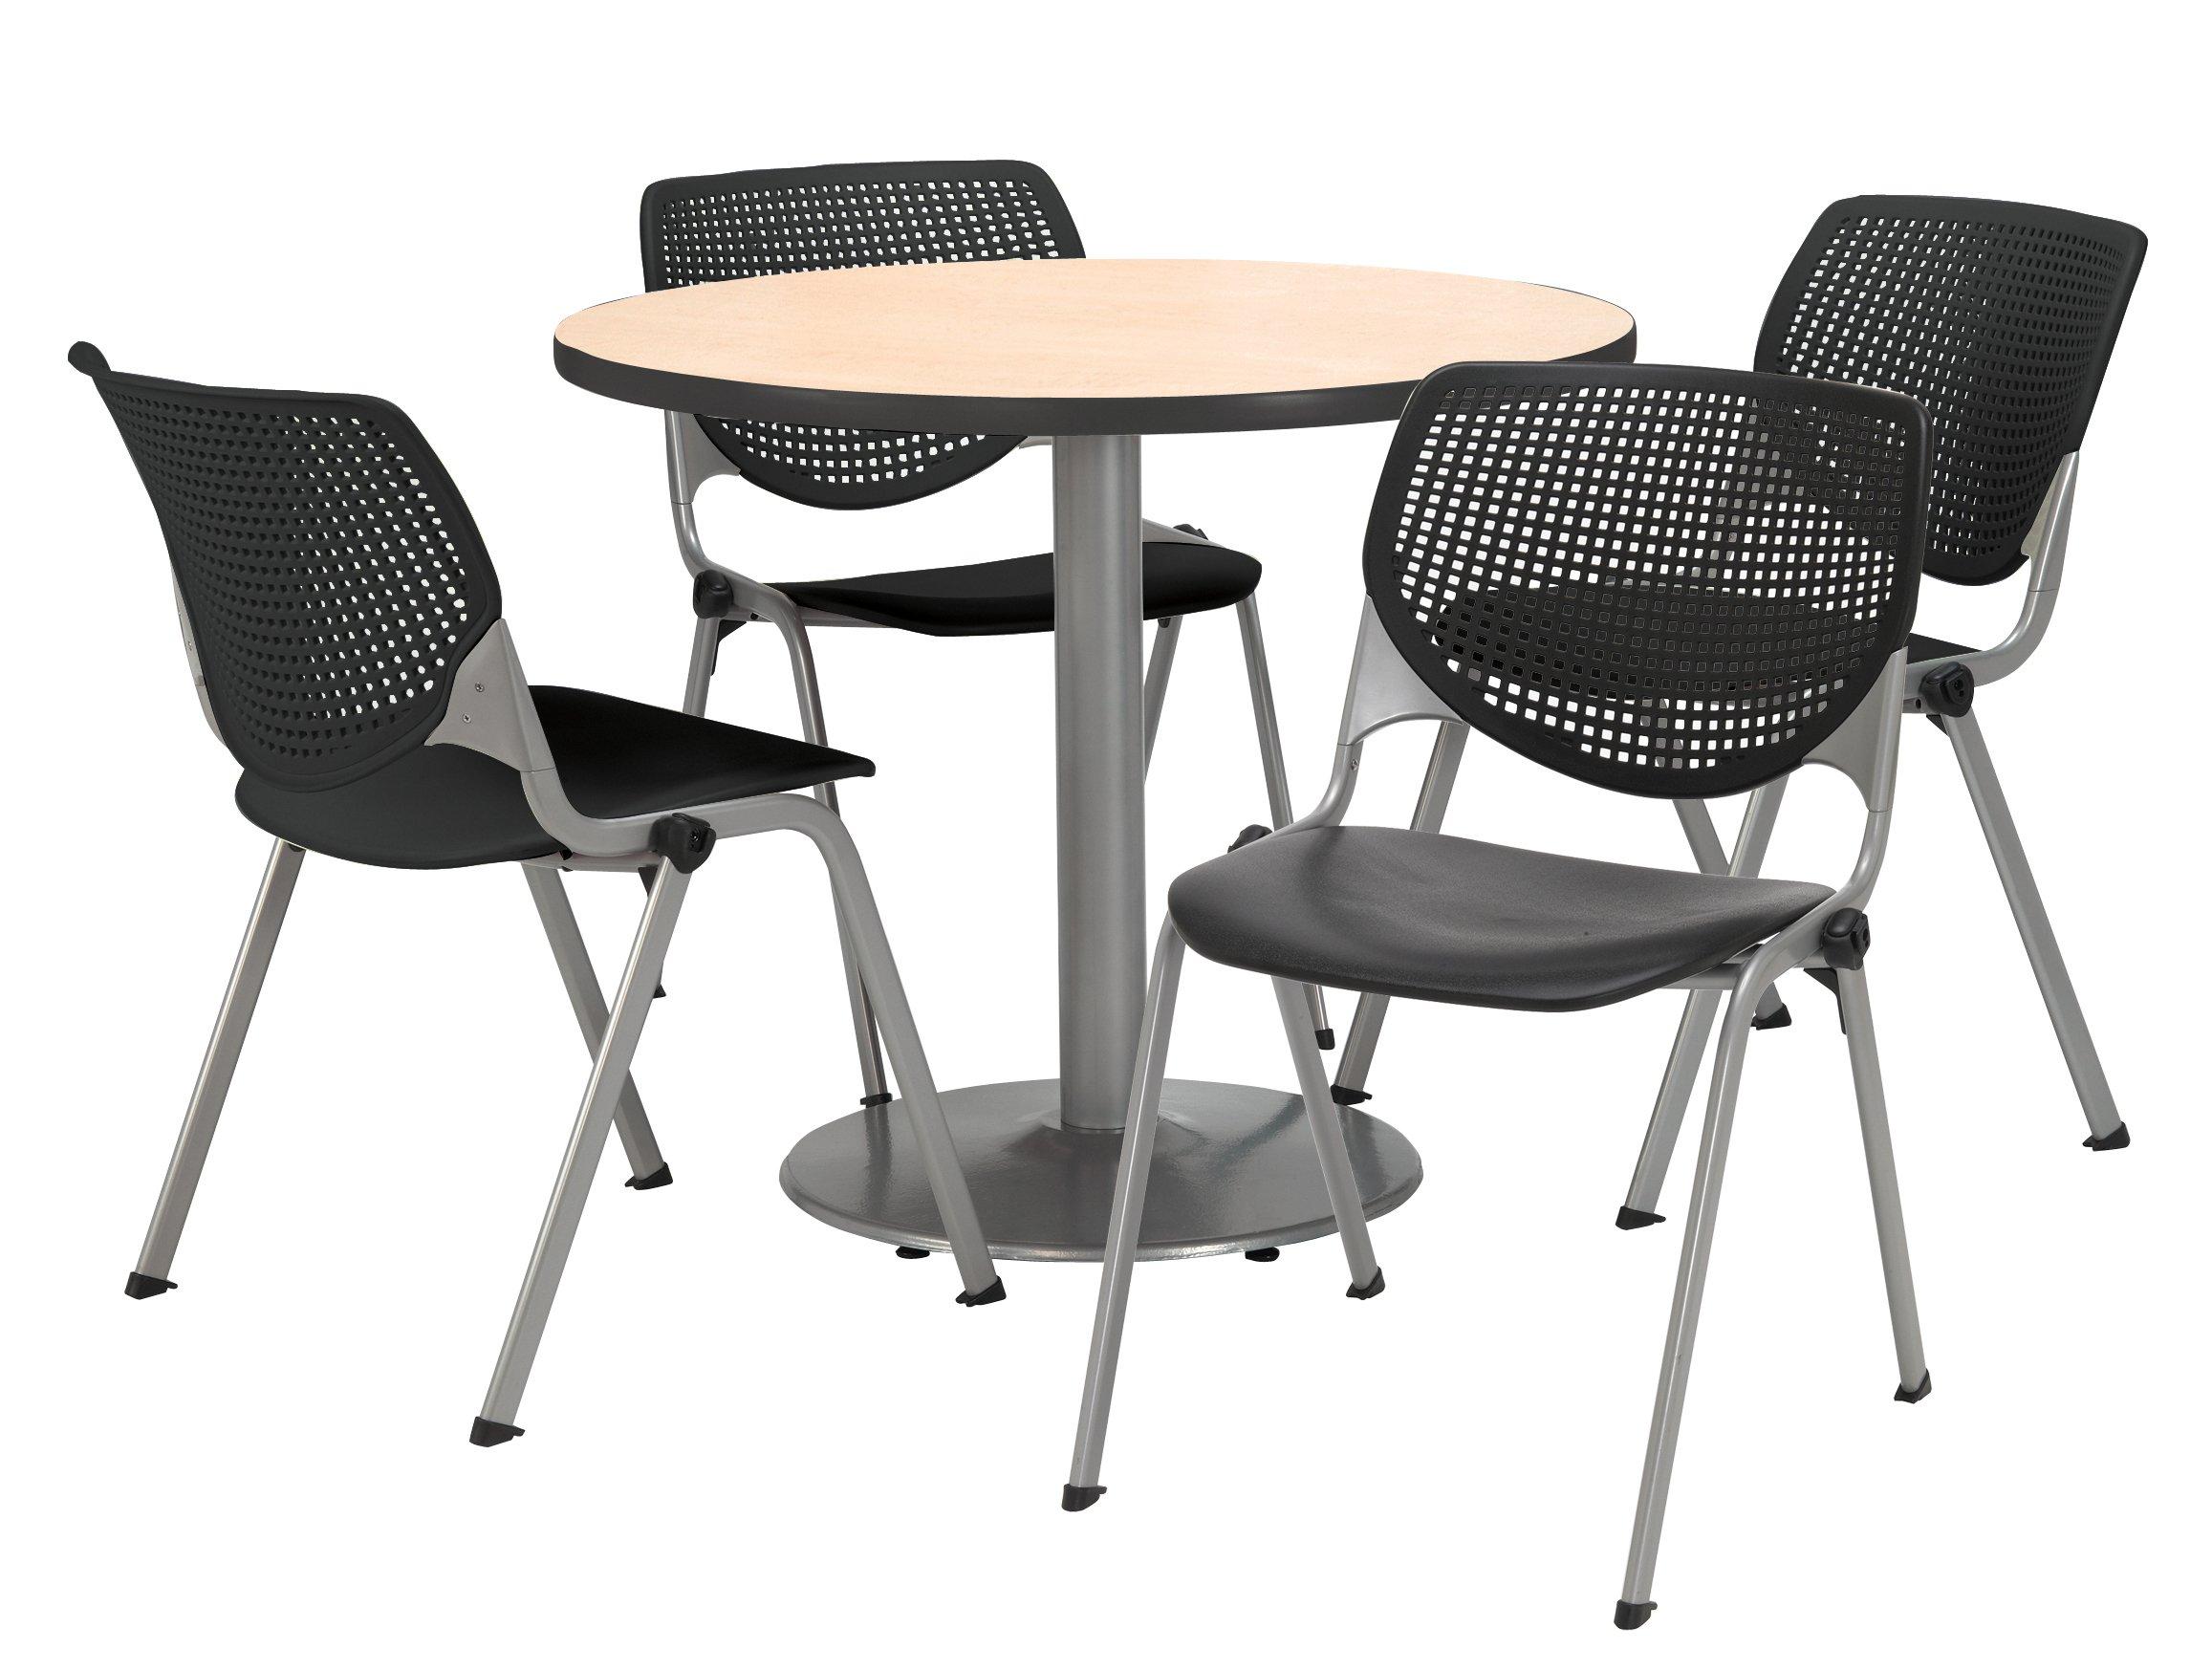 KFI Seating Round Laminate Top Pedestal Table with 4 Black Kool Series Stack Chairs, 42'' Diameter, Natural by KFI Seating